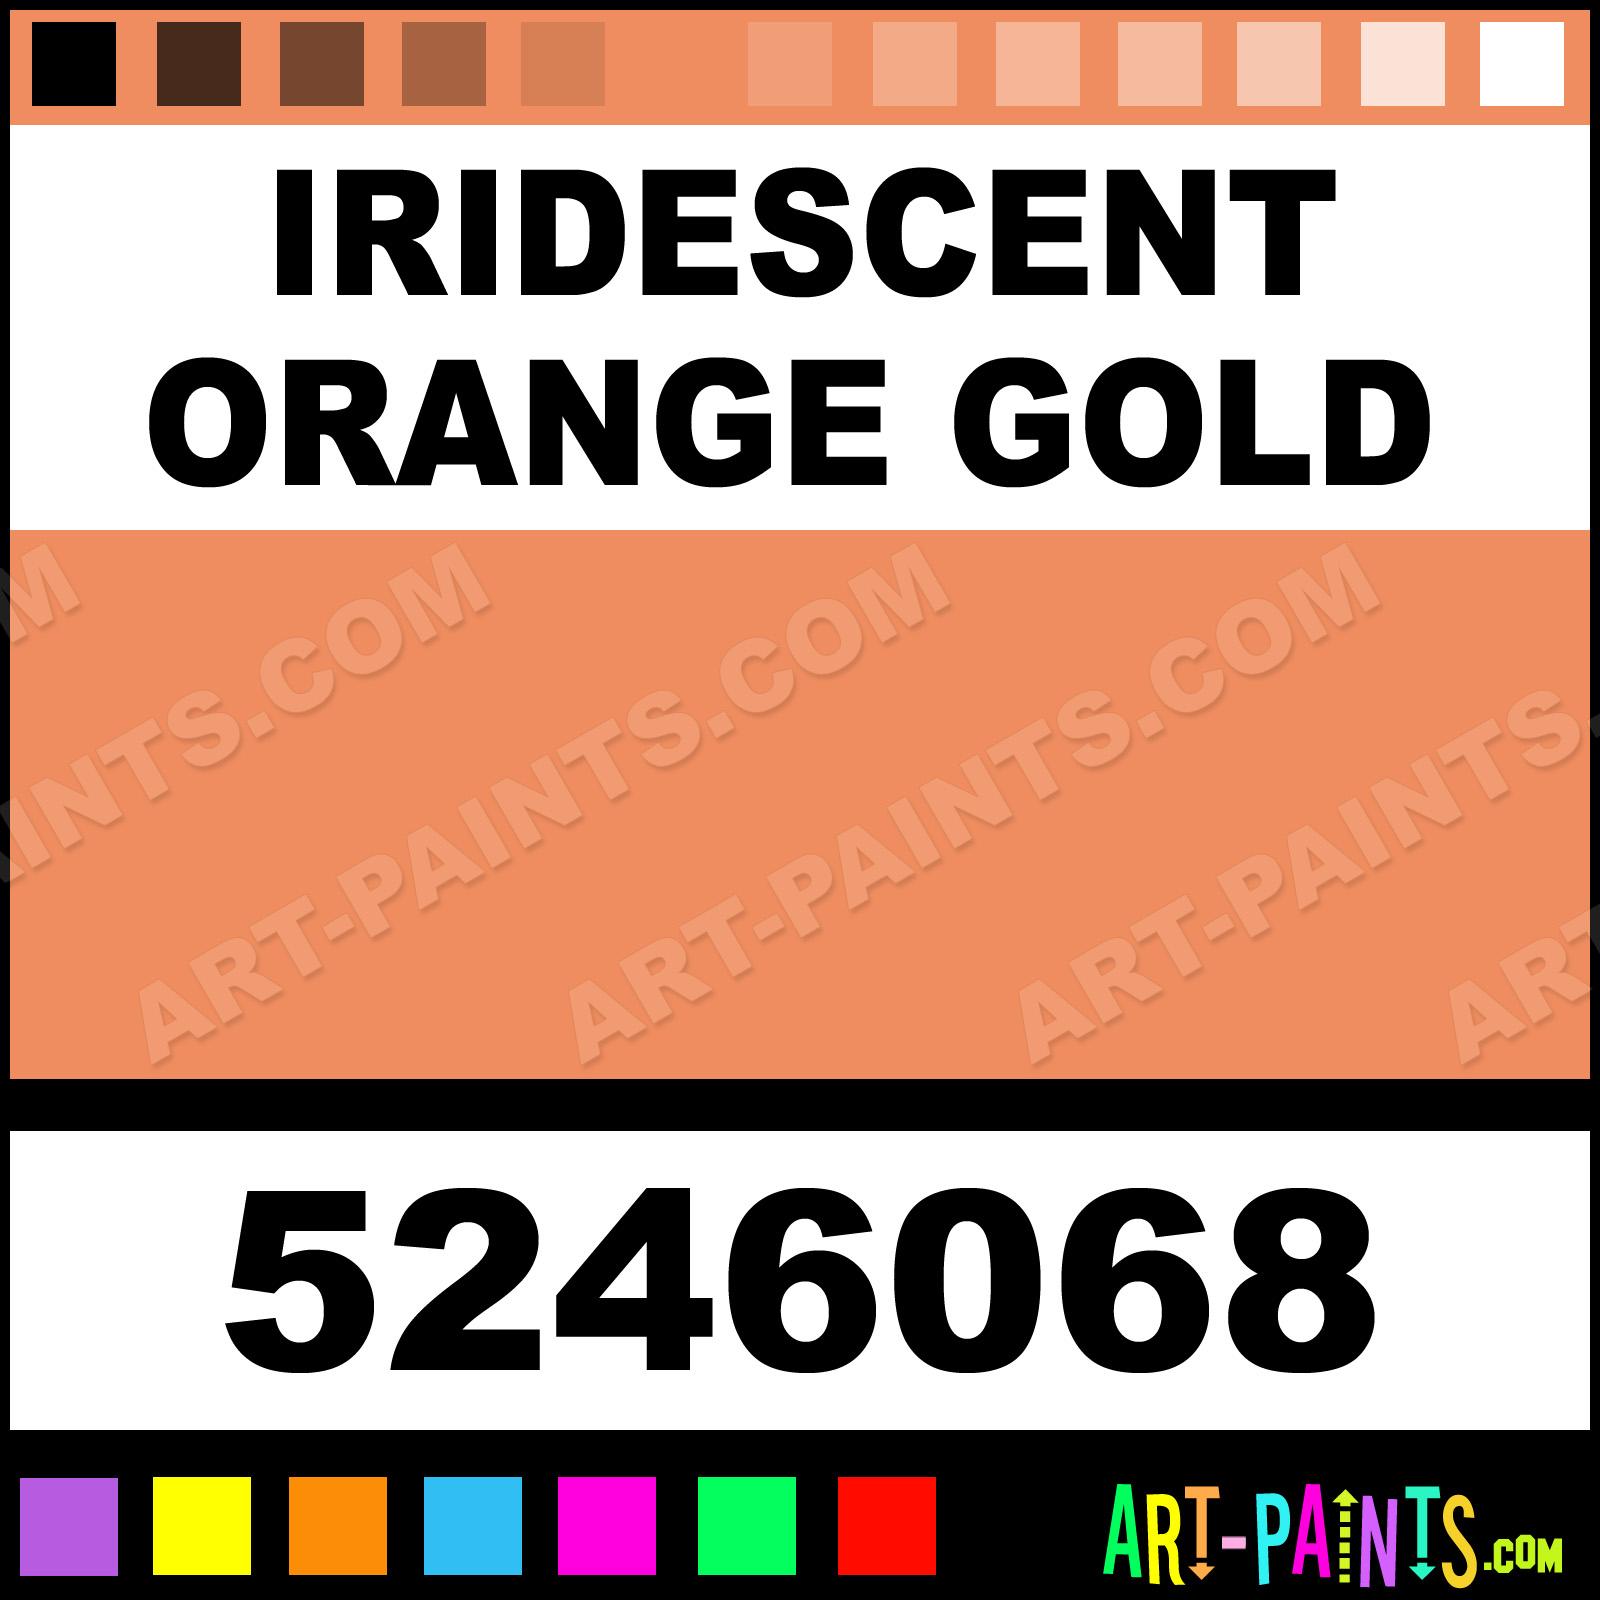 Iridescent Orange Gold Dry Permenamel Enamel Paints